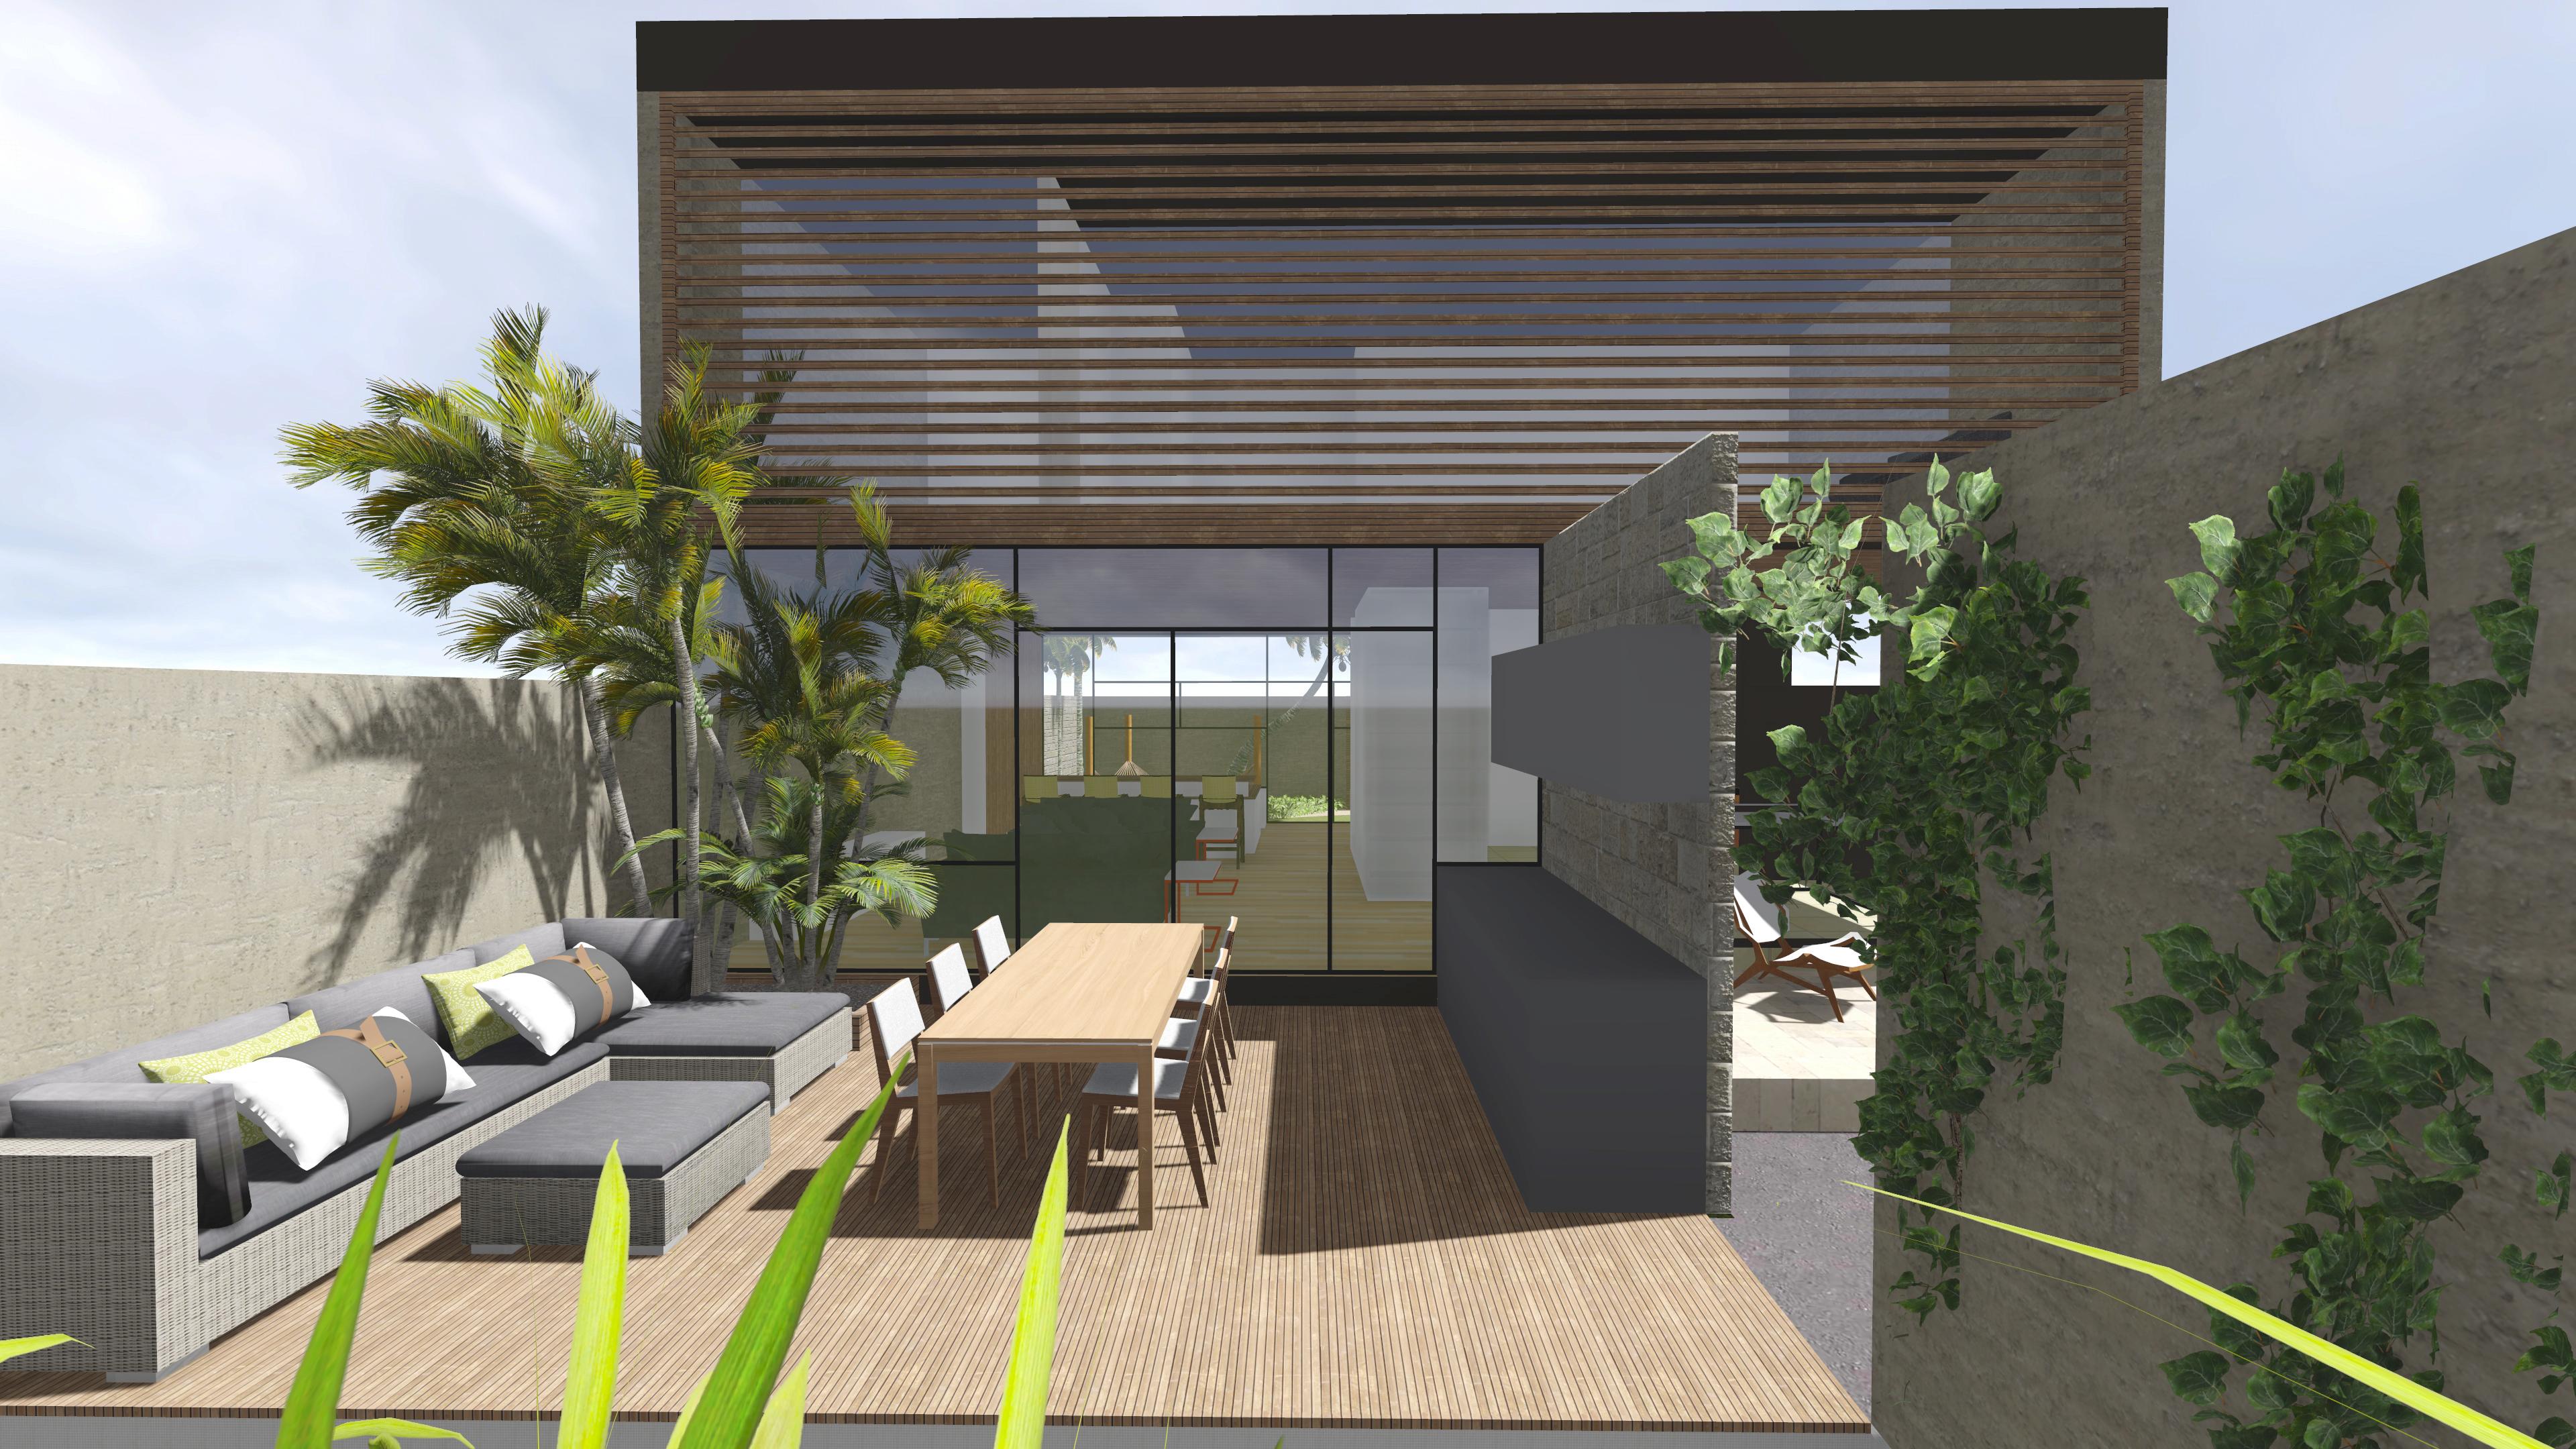 Casa Moderna projeto arquitetônico